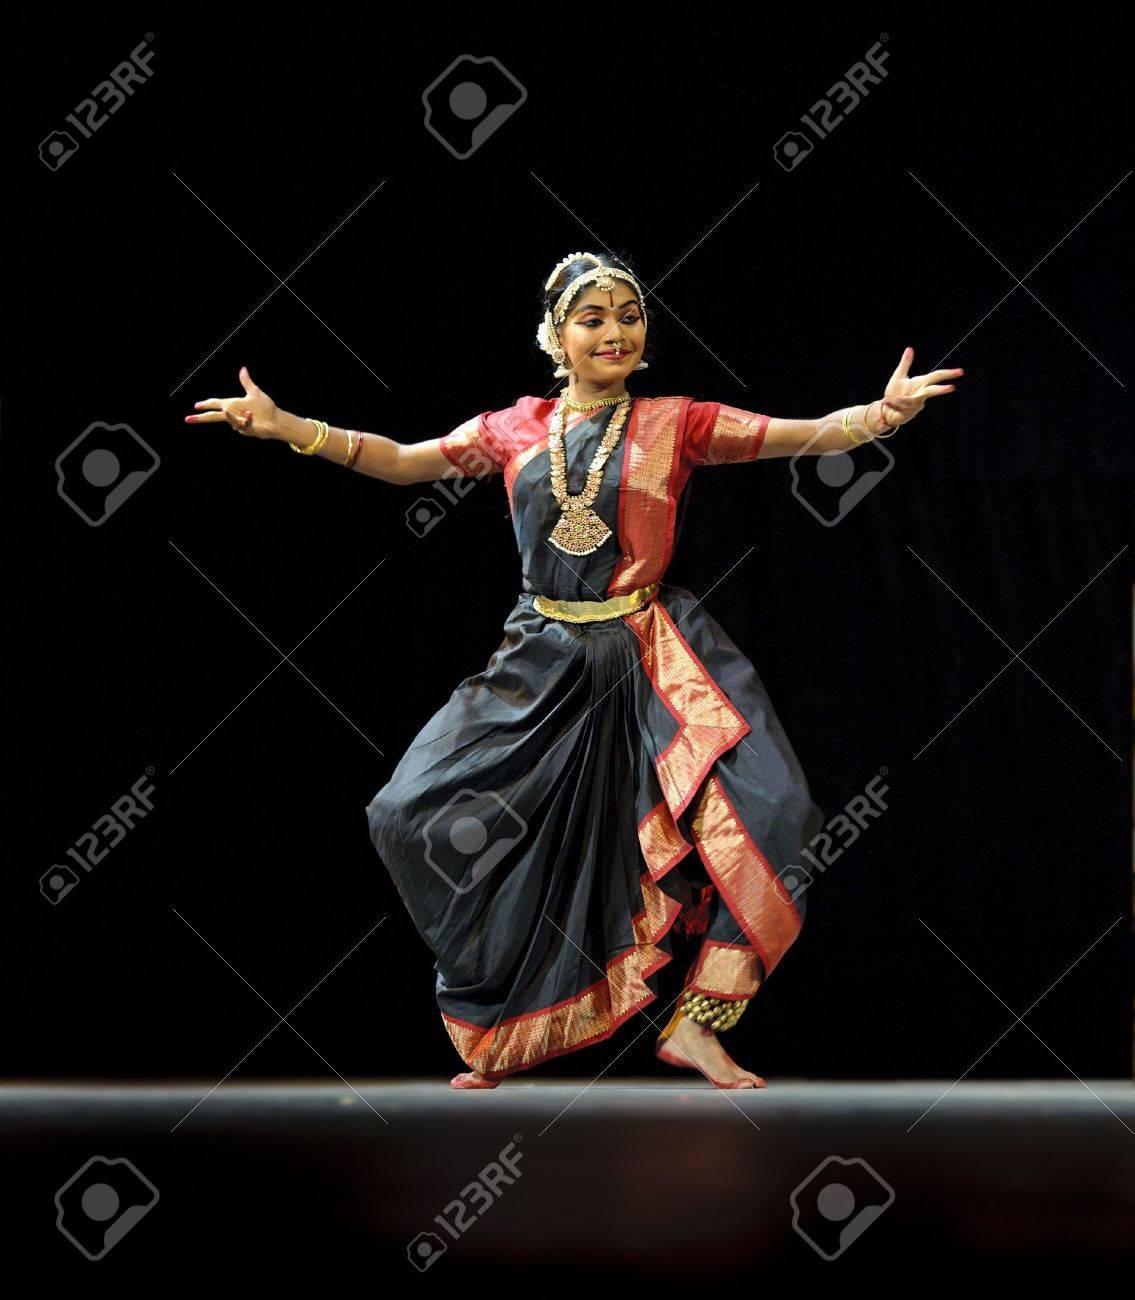 Indian Folk Dance Pictures Oct 24 Indian Folk Dance